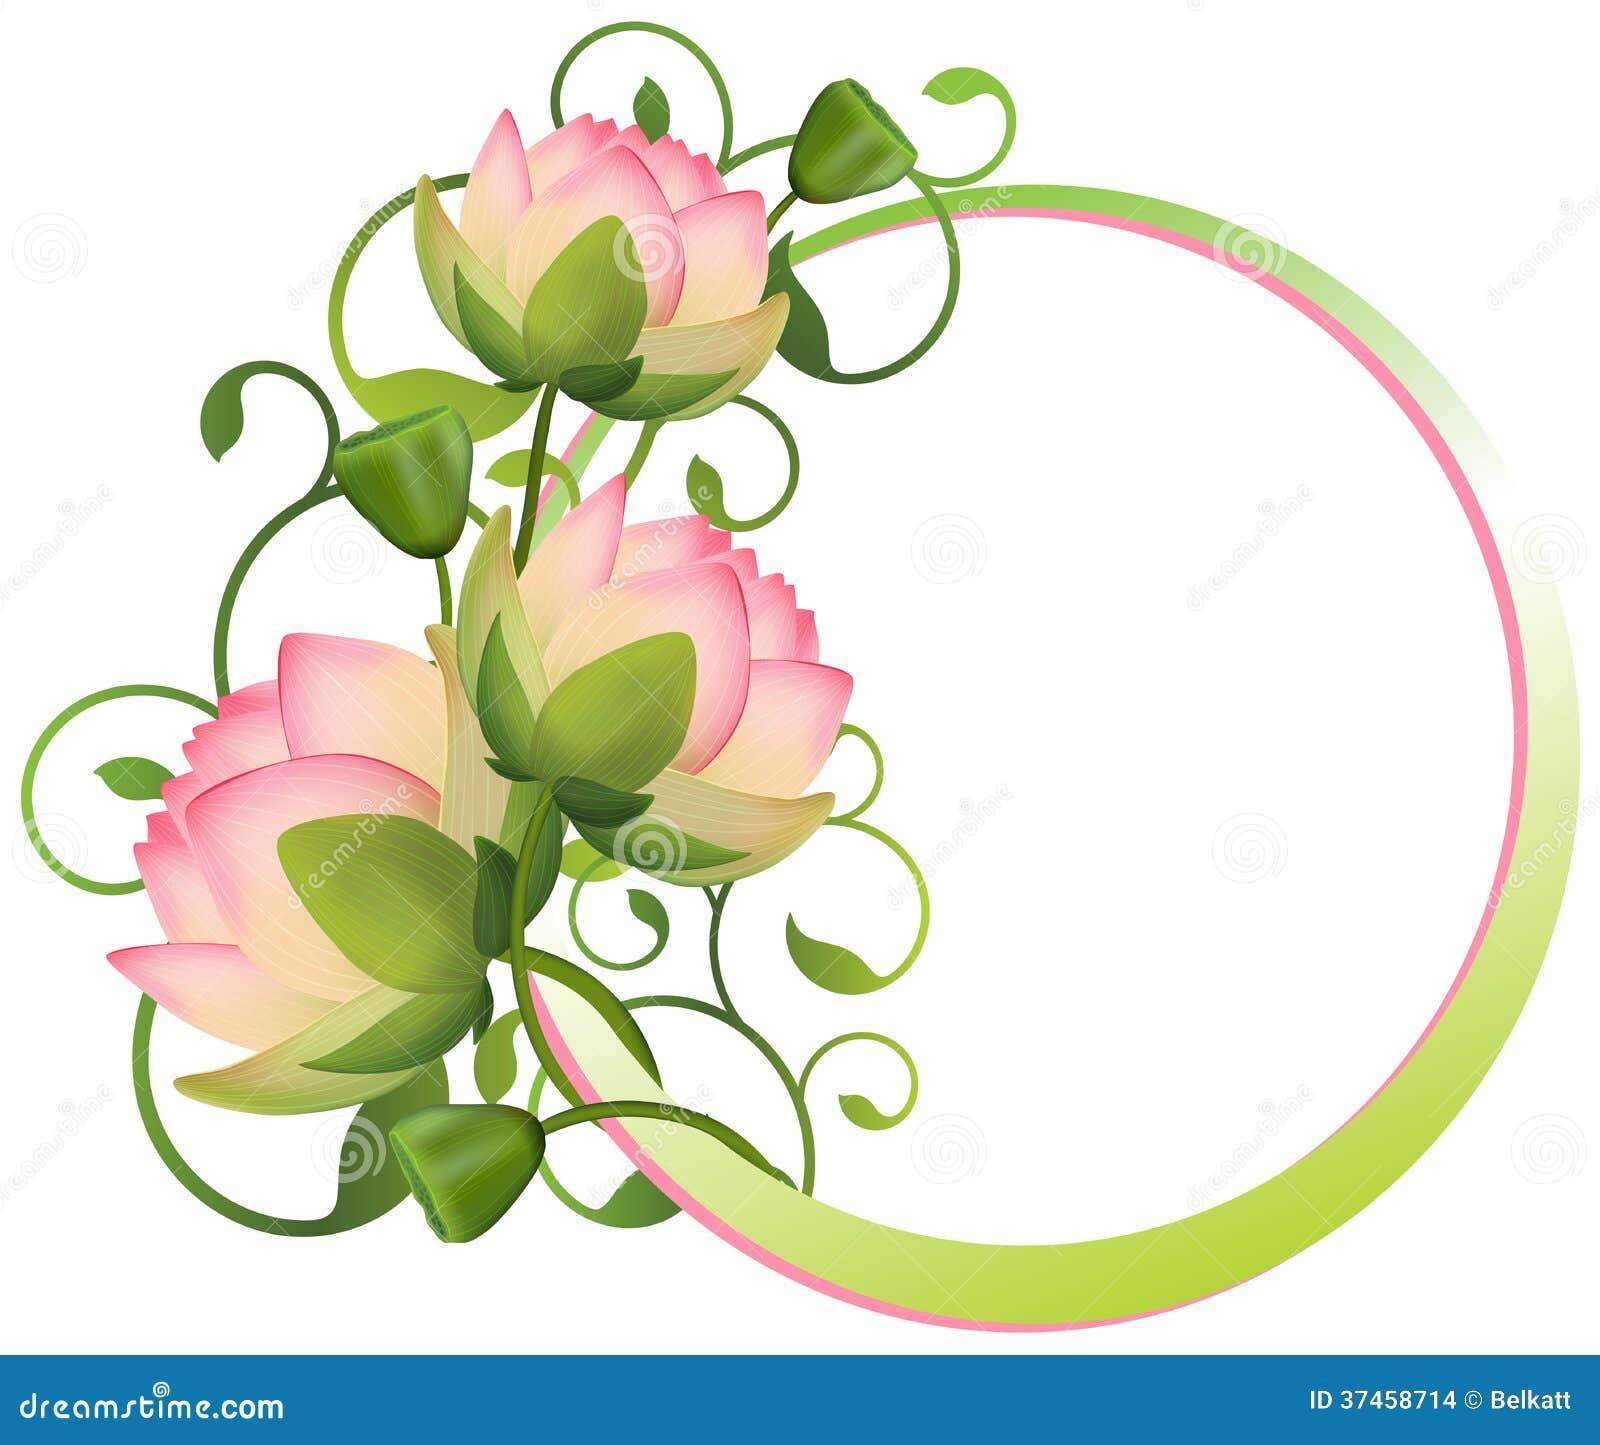 Marco de la flor flor de loto ilustraci n del vector for Disegno 3d free